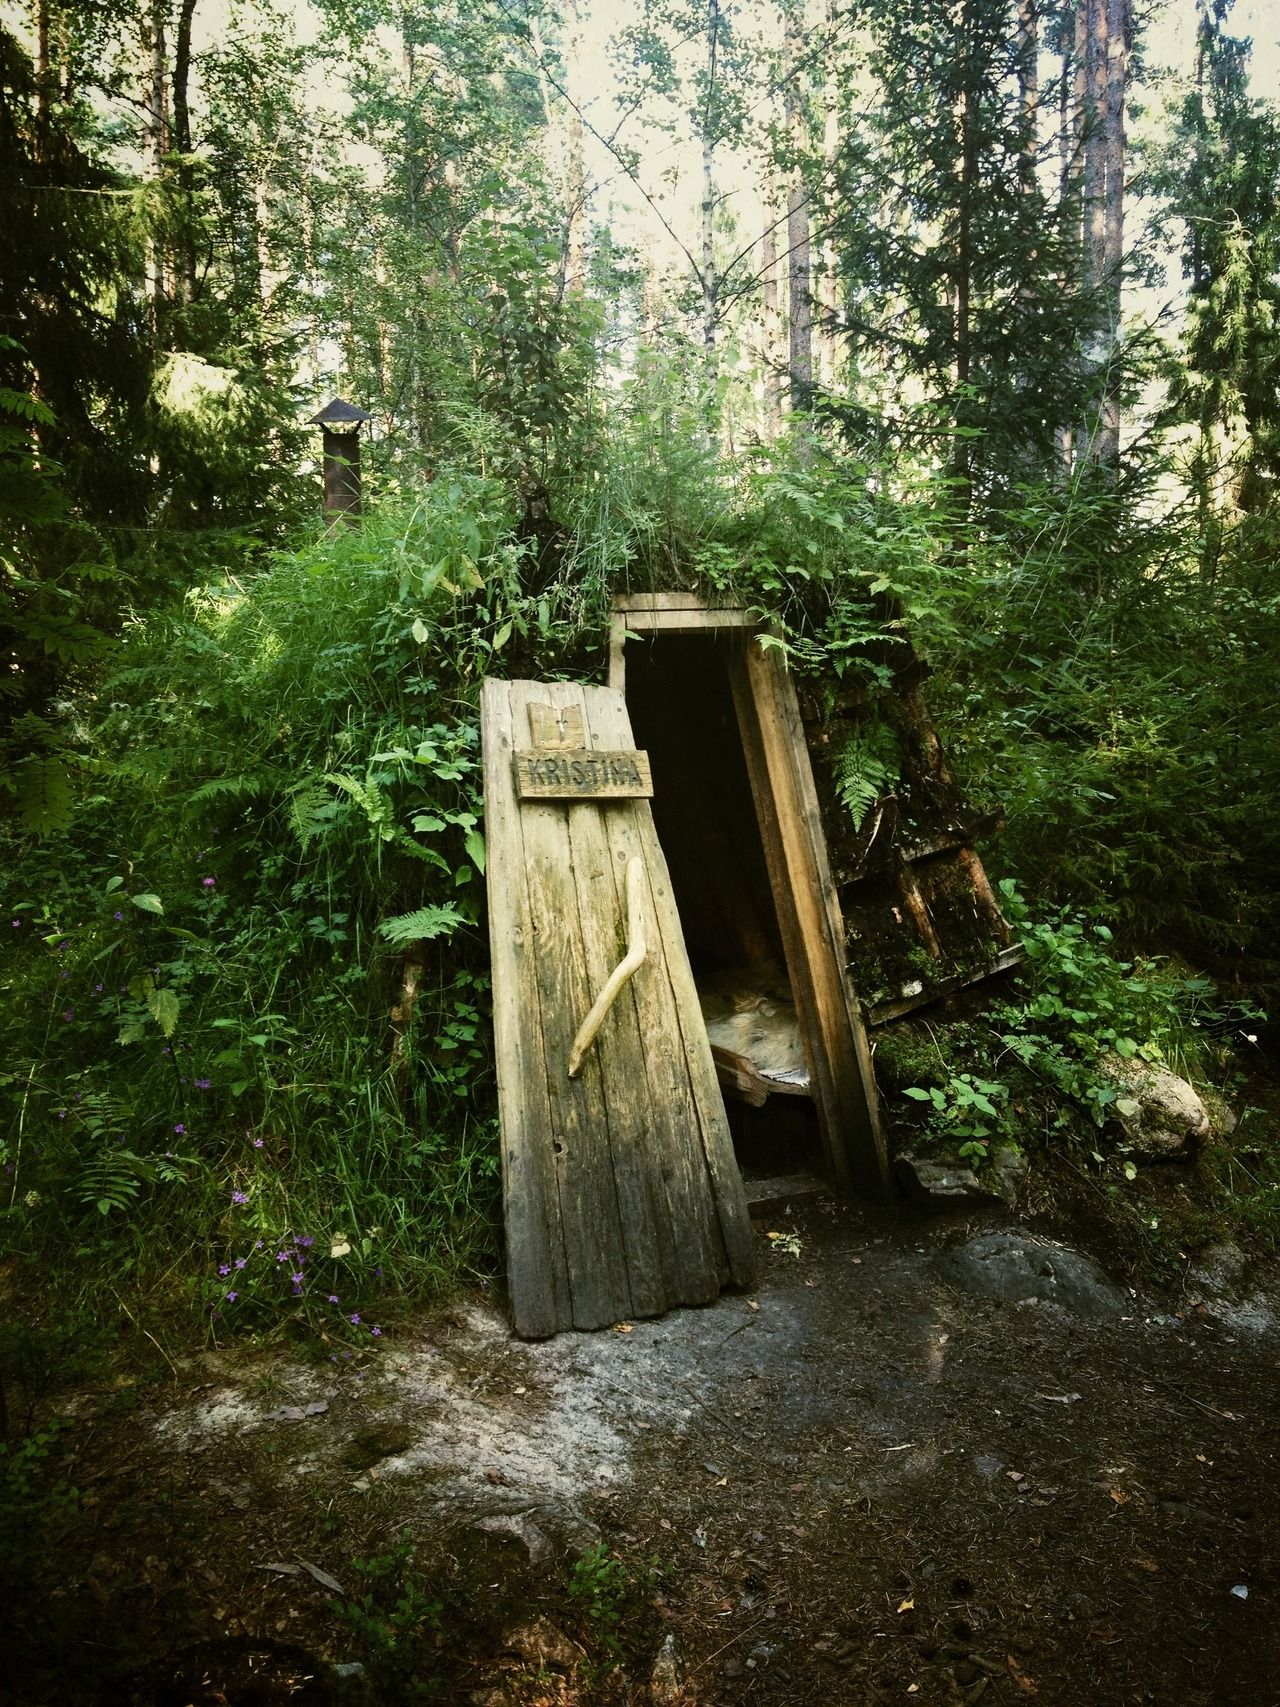 The 'Kristina Forest Hut' at Kolarbyn Eco Lodge near Skinnskatteberg, Sweden.